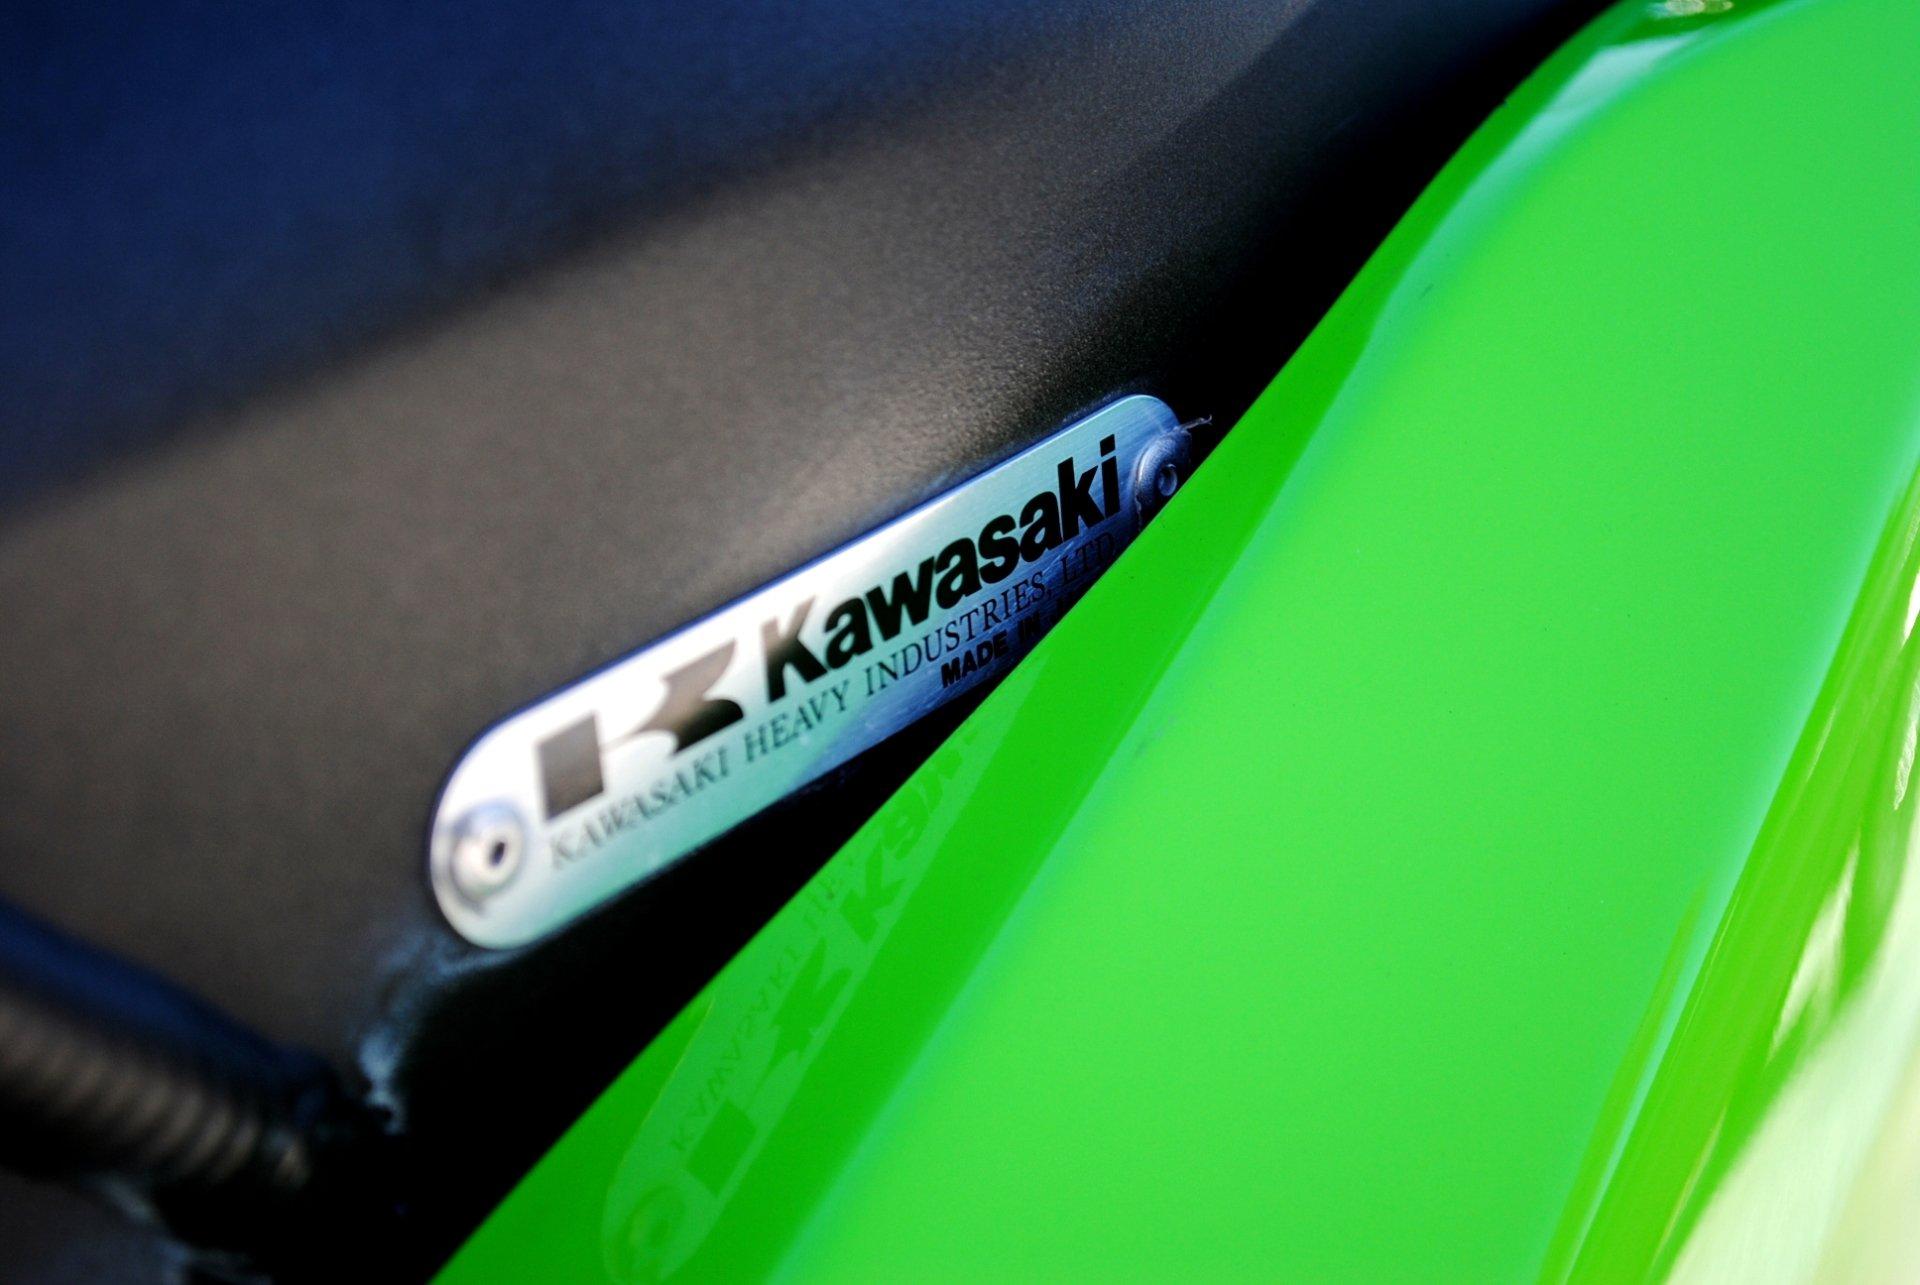 Fahrzeuge - Kawasaki  Wallpaper